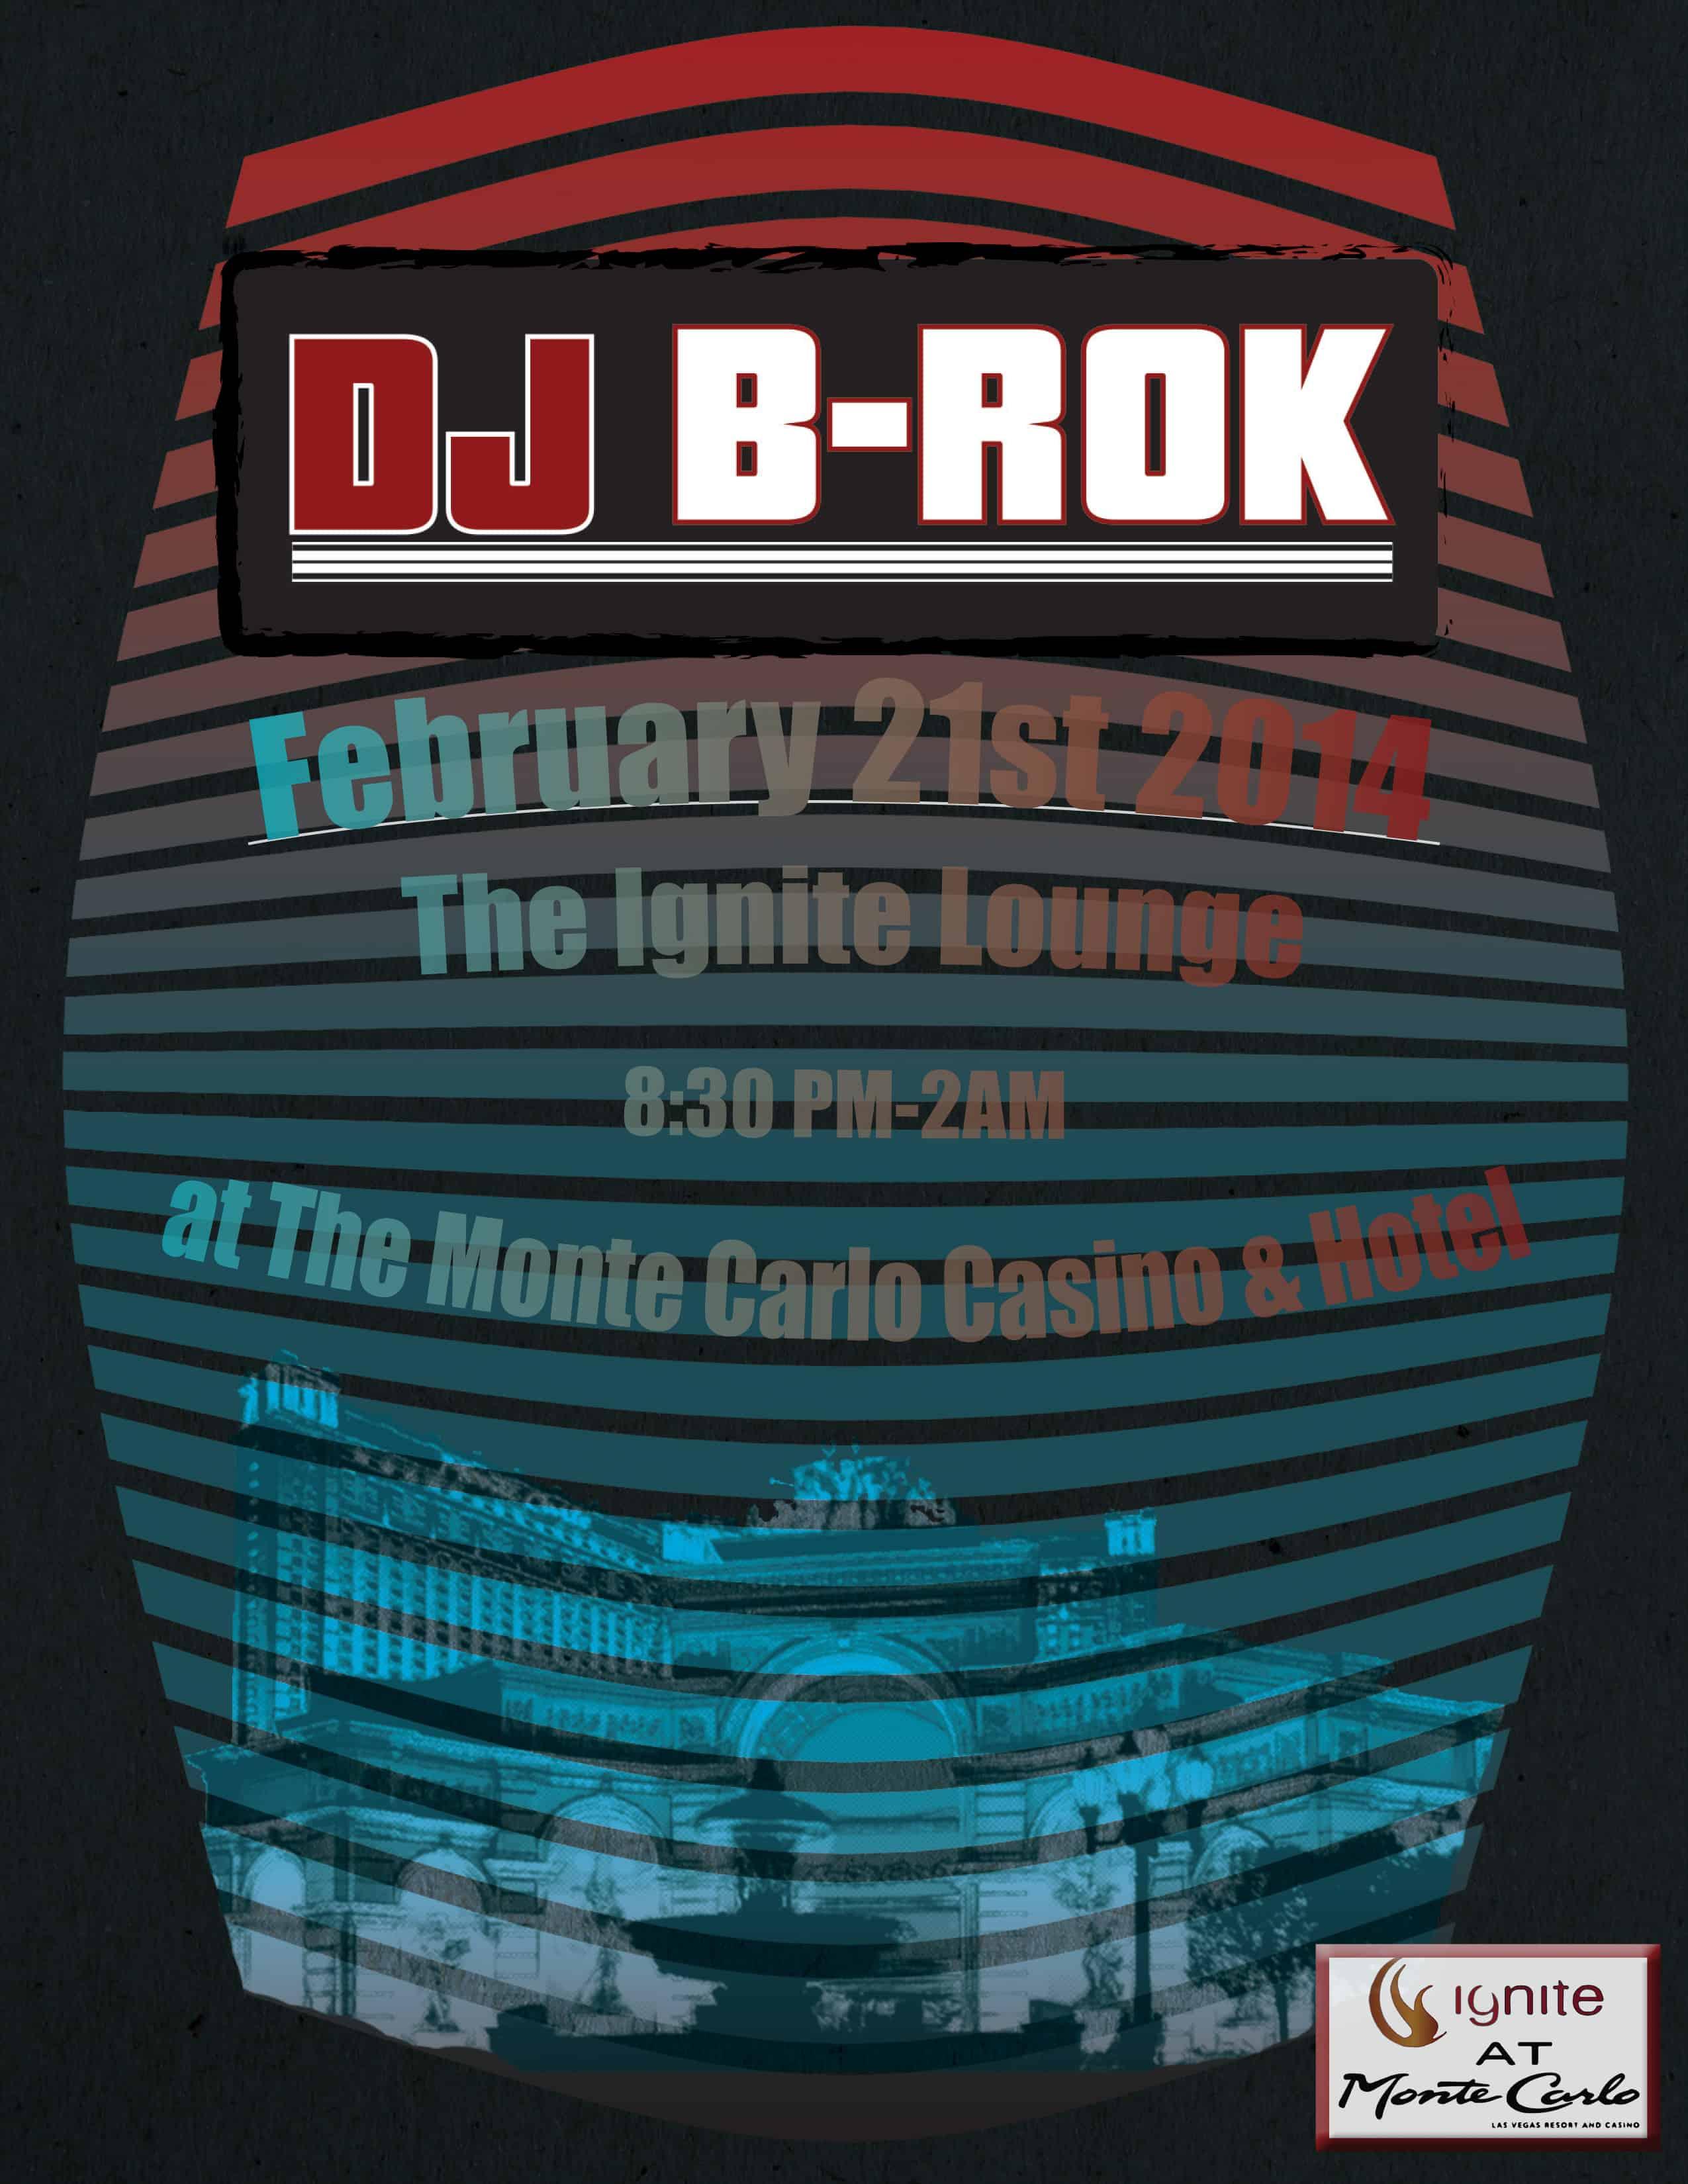 DJ BROK 1